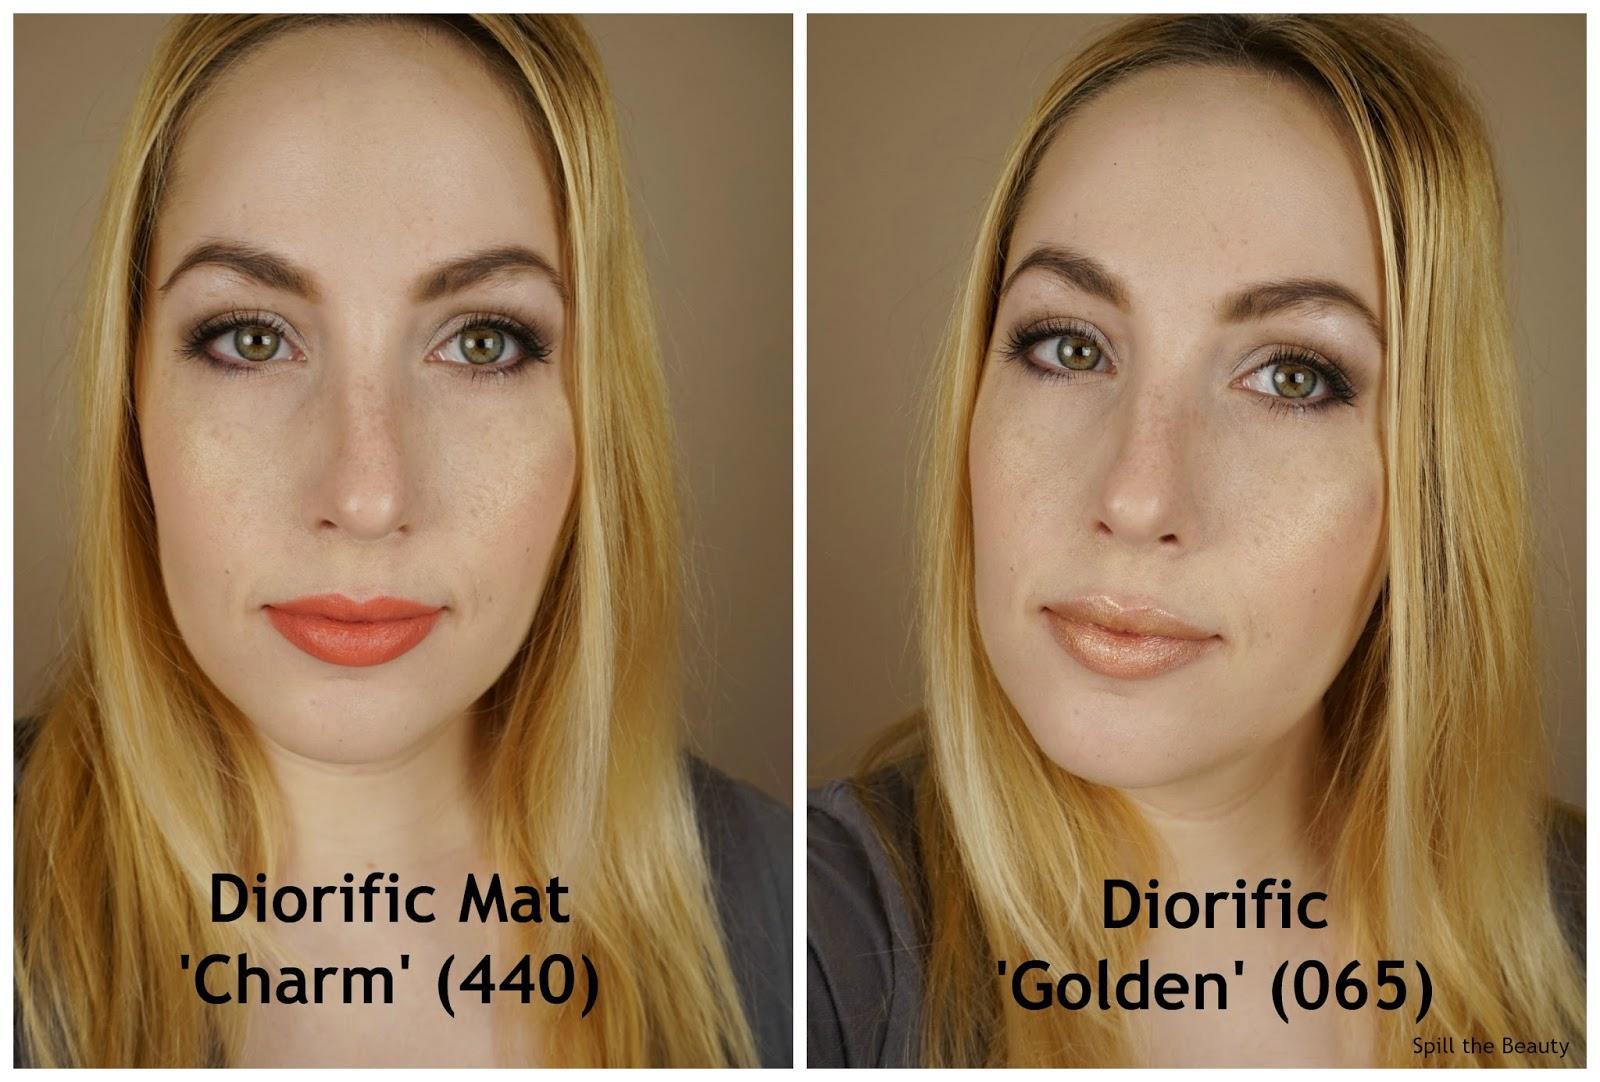 dior holiday makeup 2016 3.3 lipstick swatch charm golden